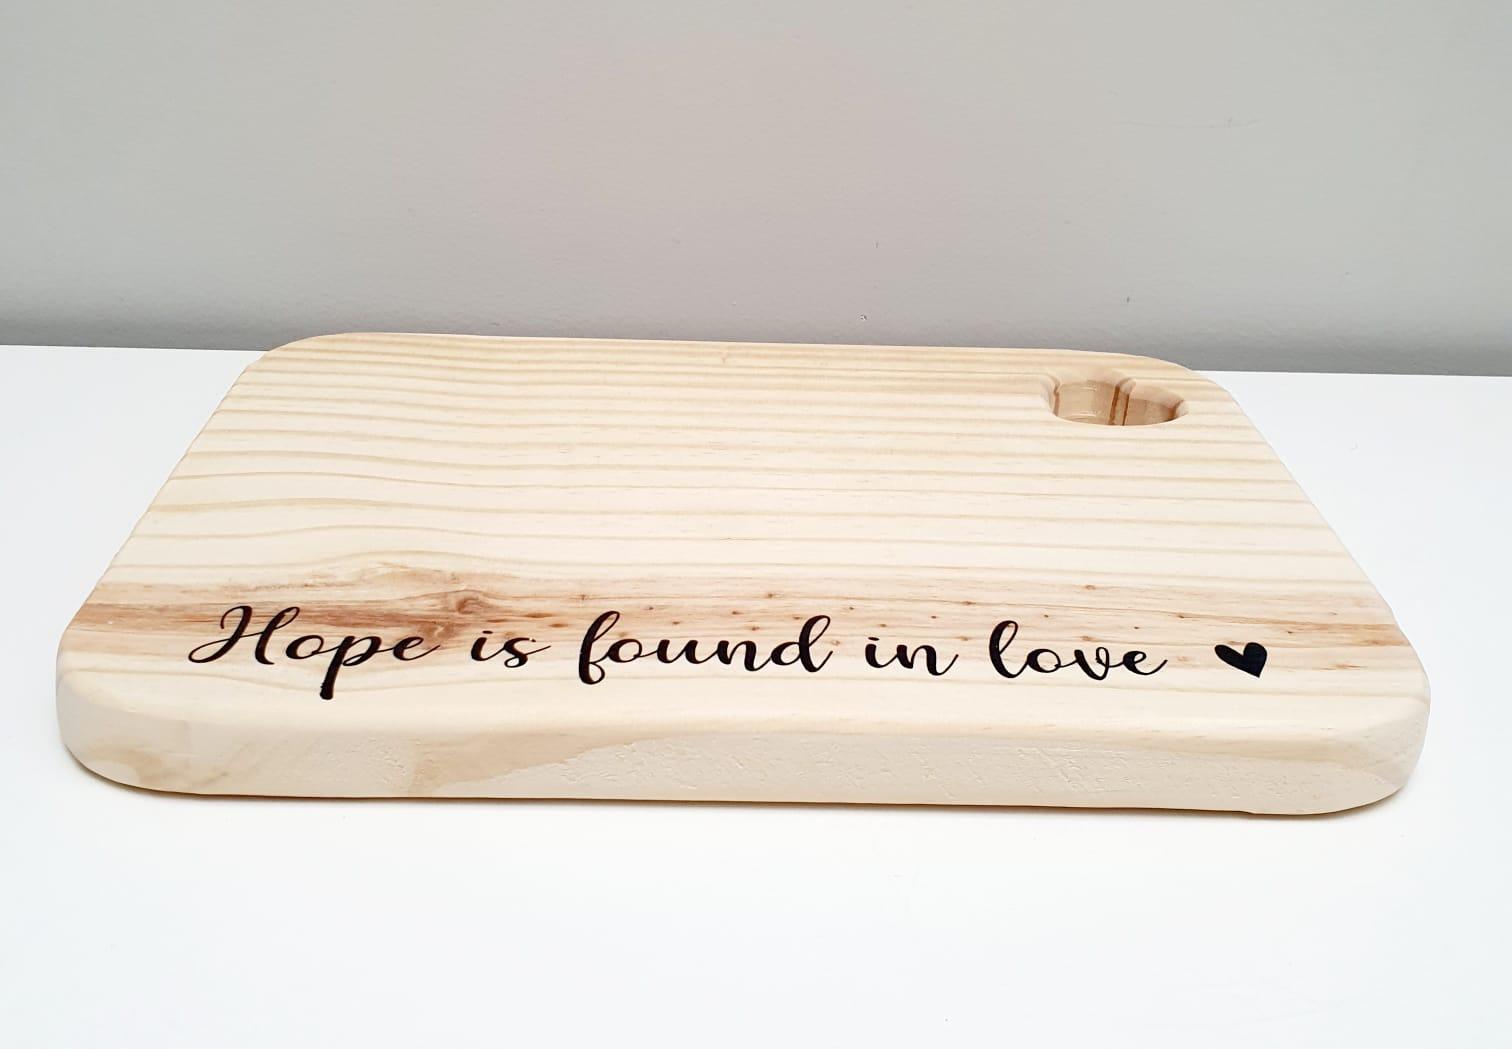 Tábua de madeira retangular - Hope is found in love